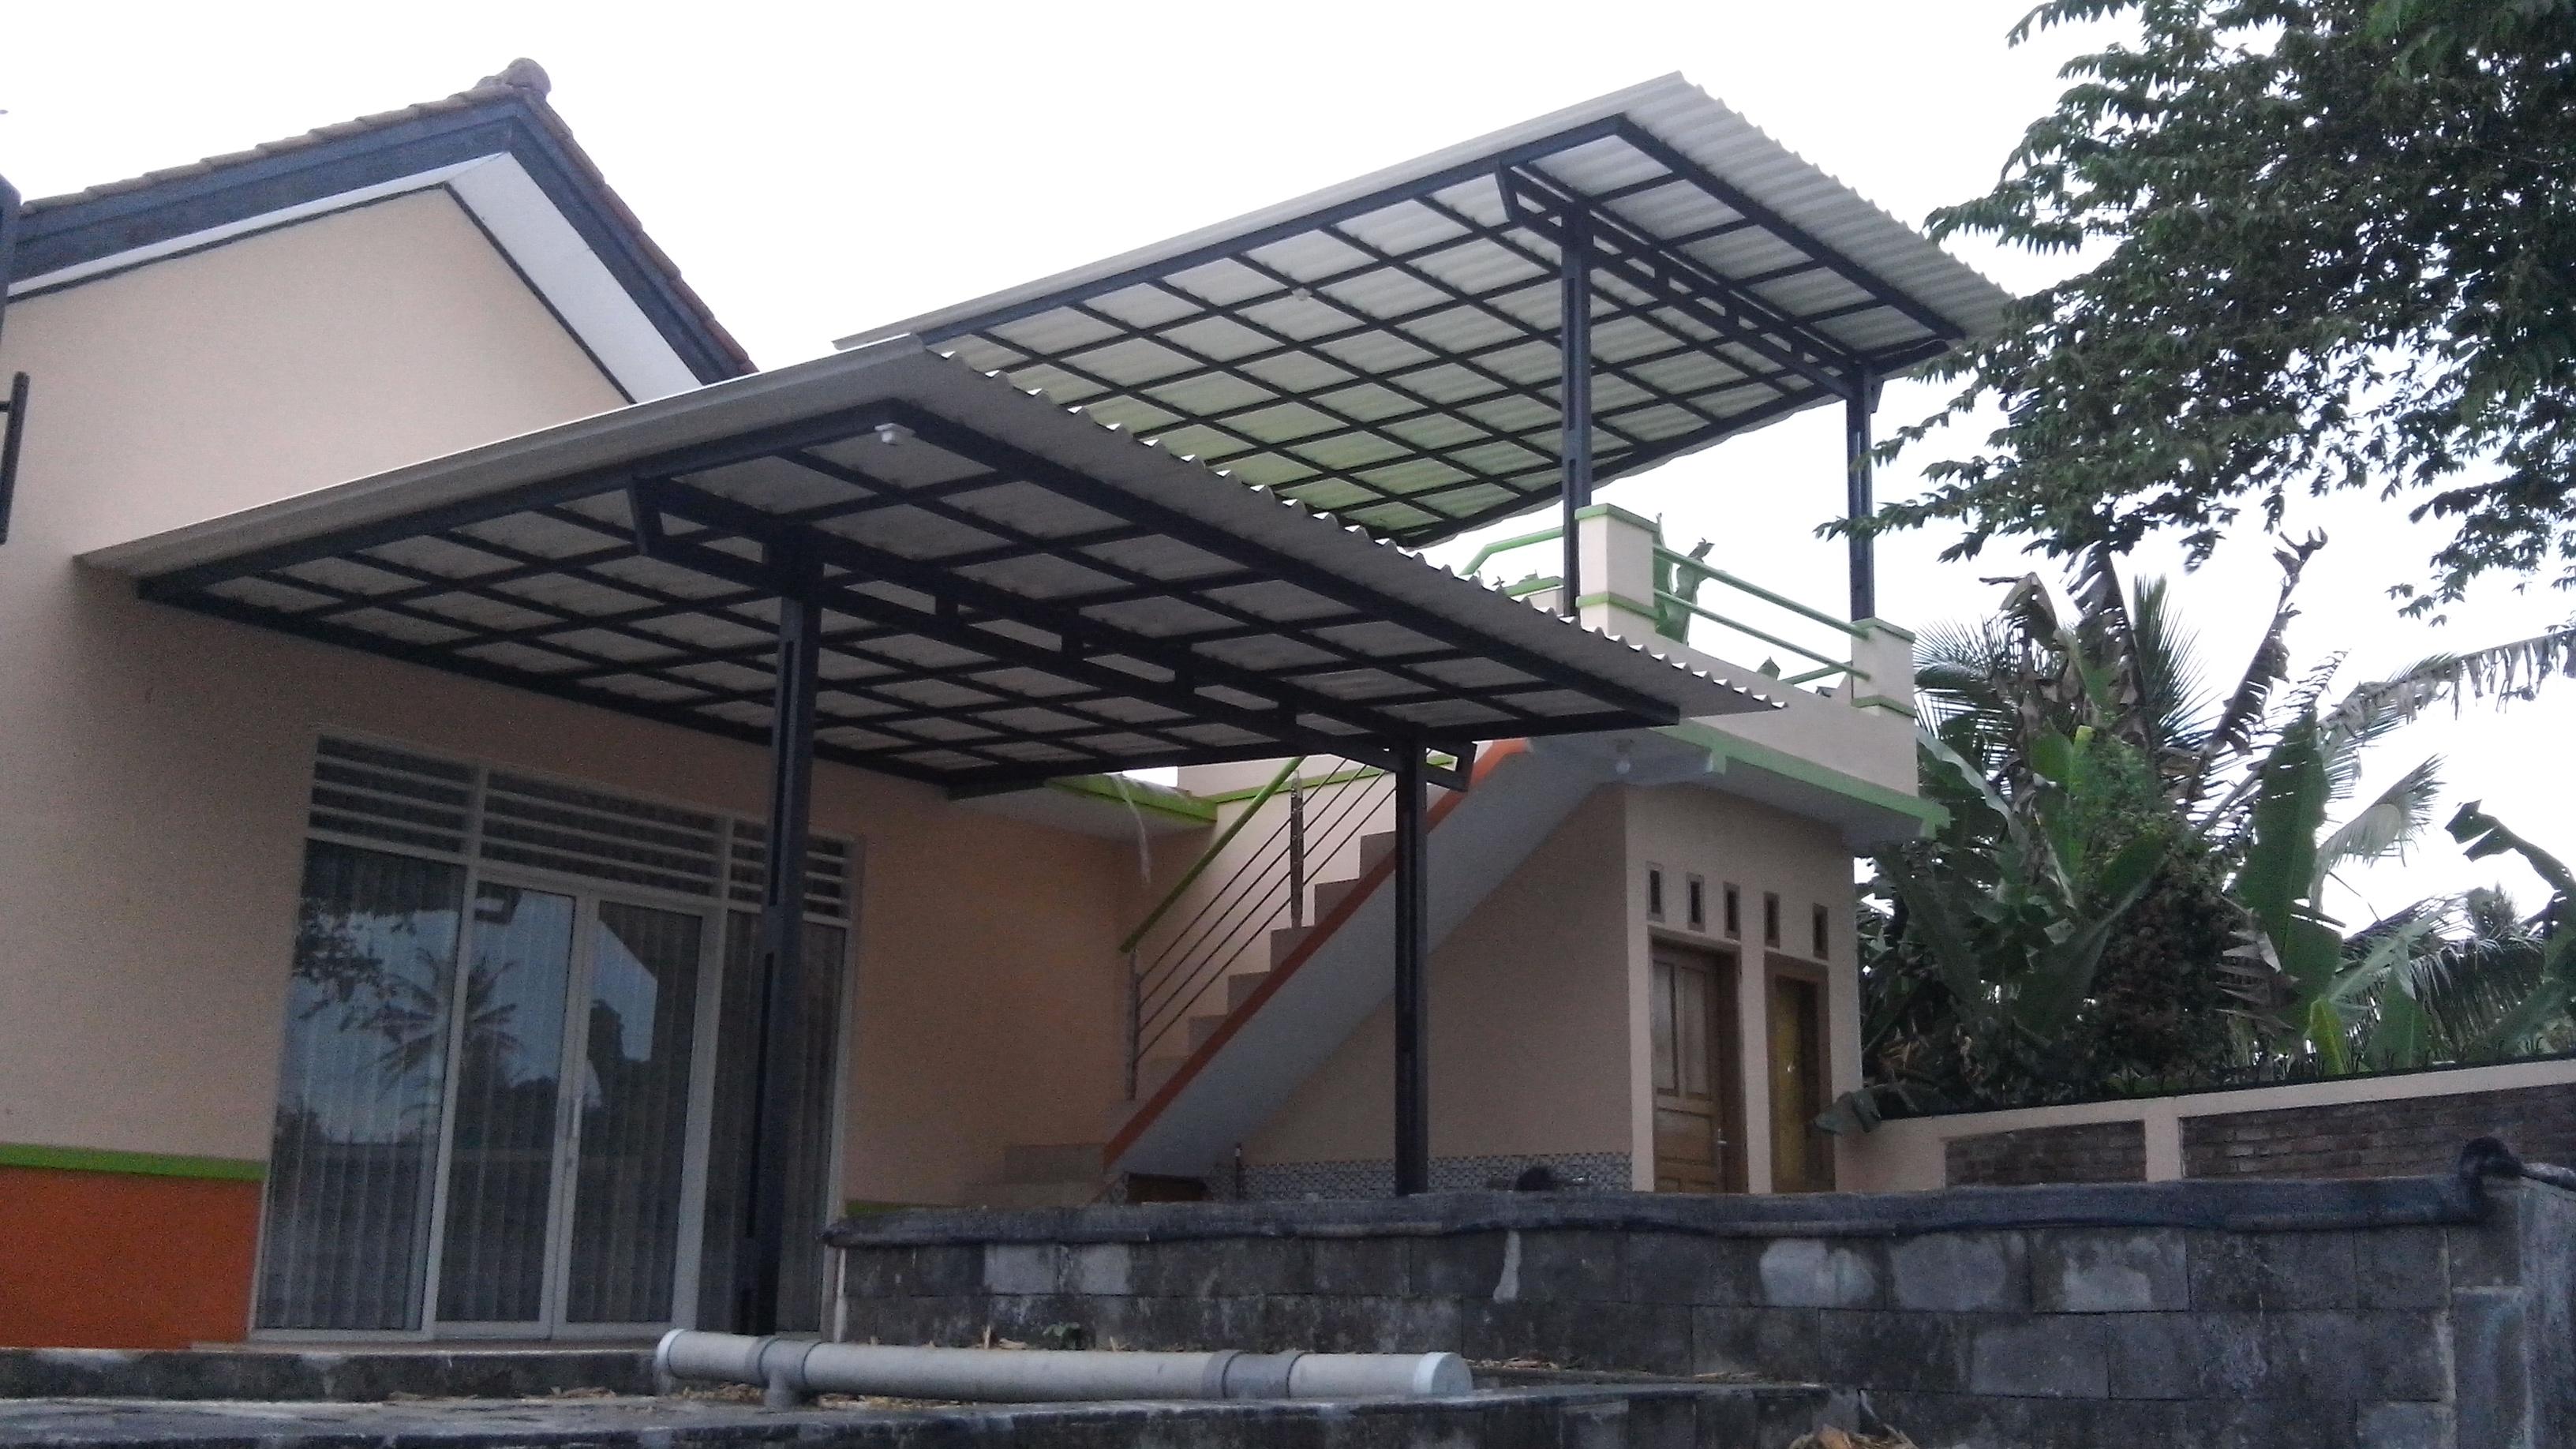 harga ganti atap baja ringan daftar kanopi alderon spandek polycarbonate 2017 ...